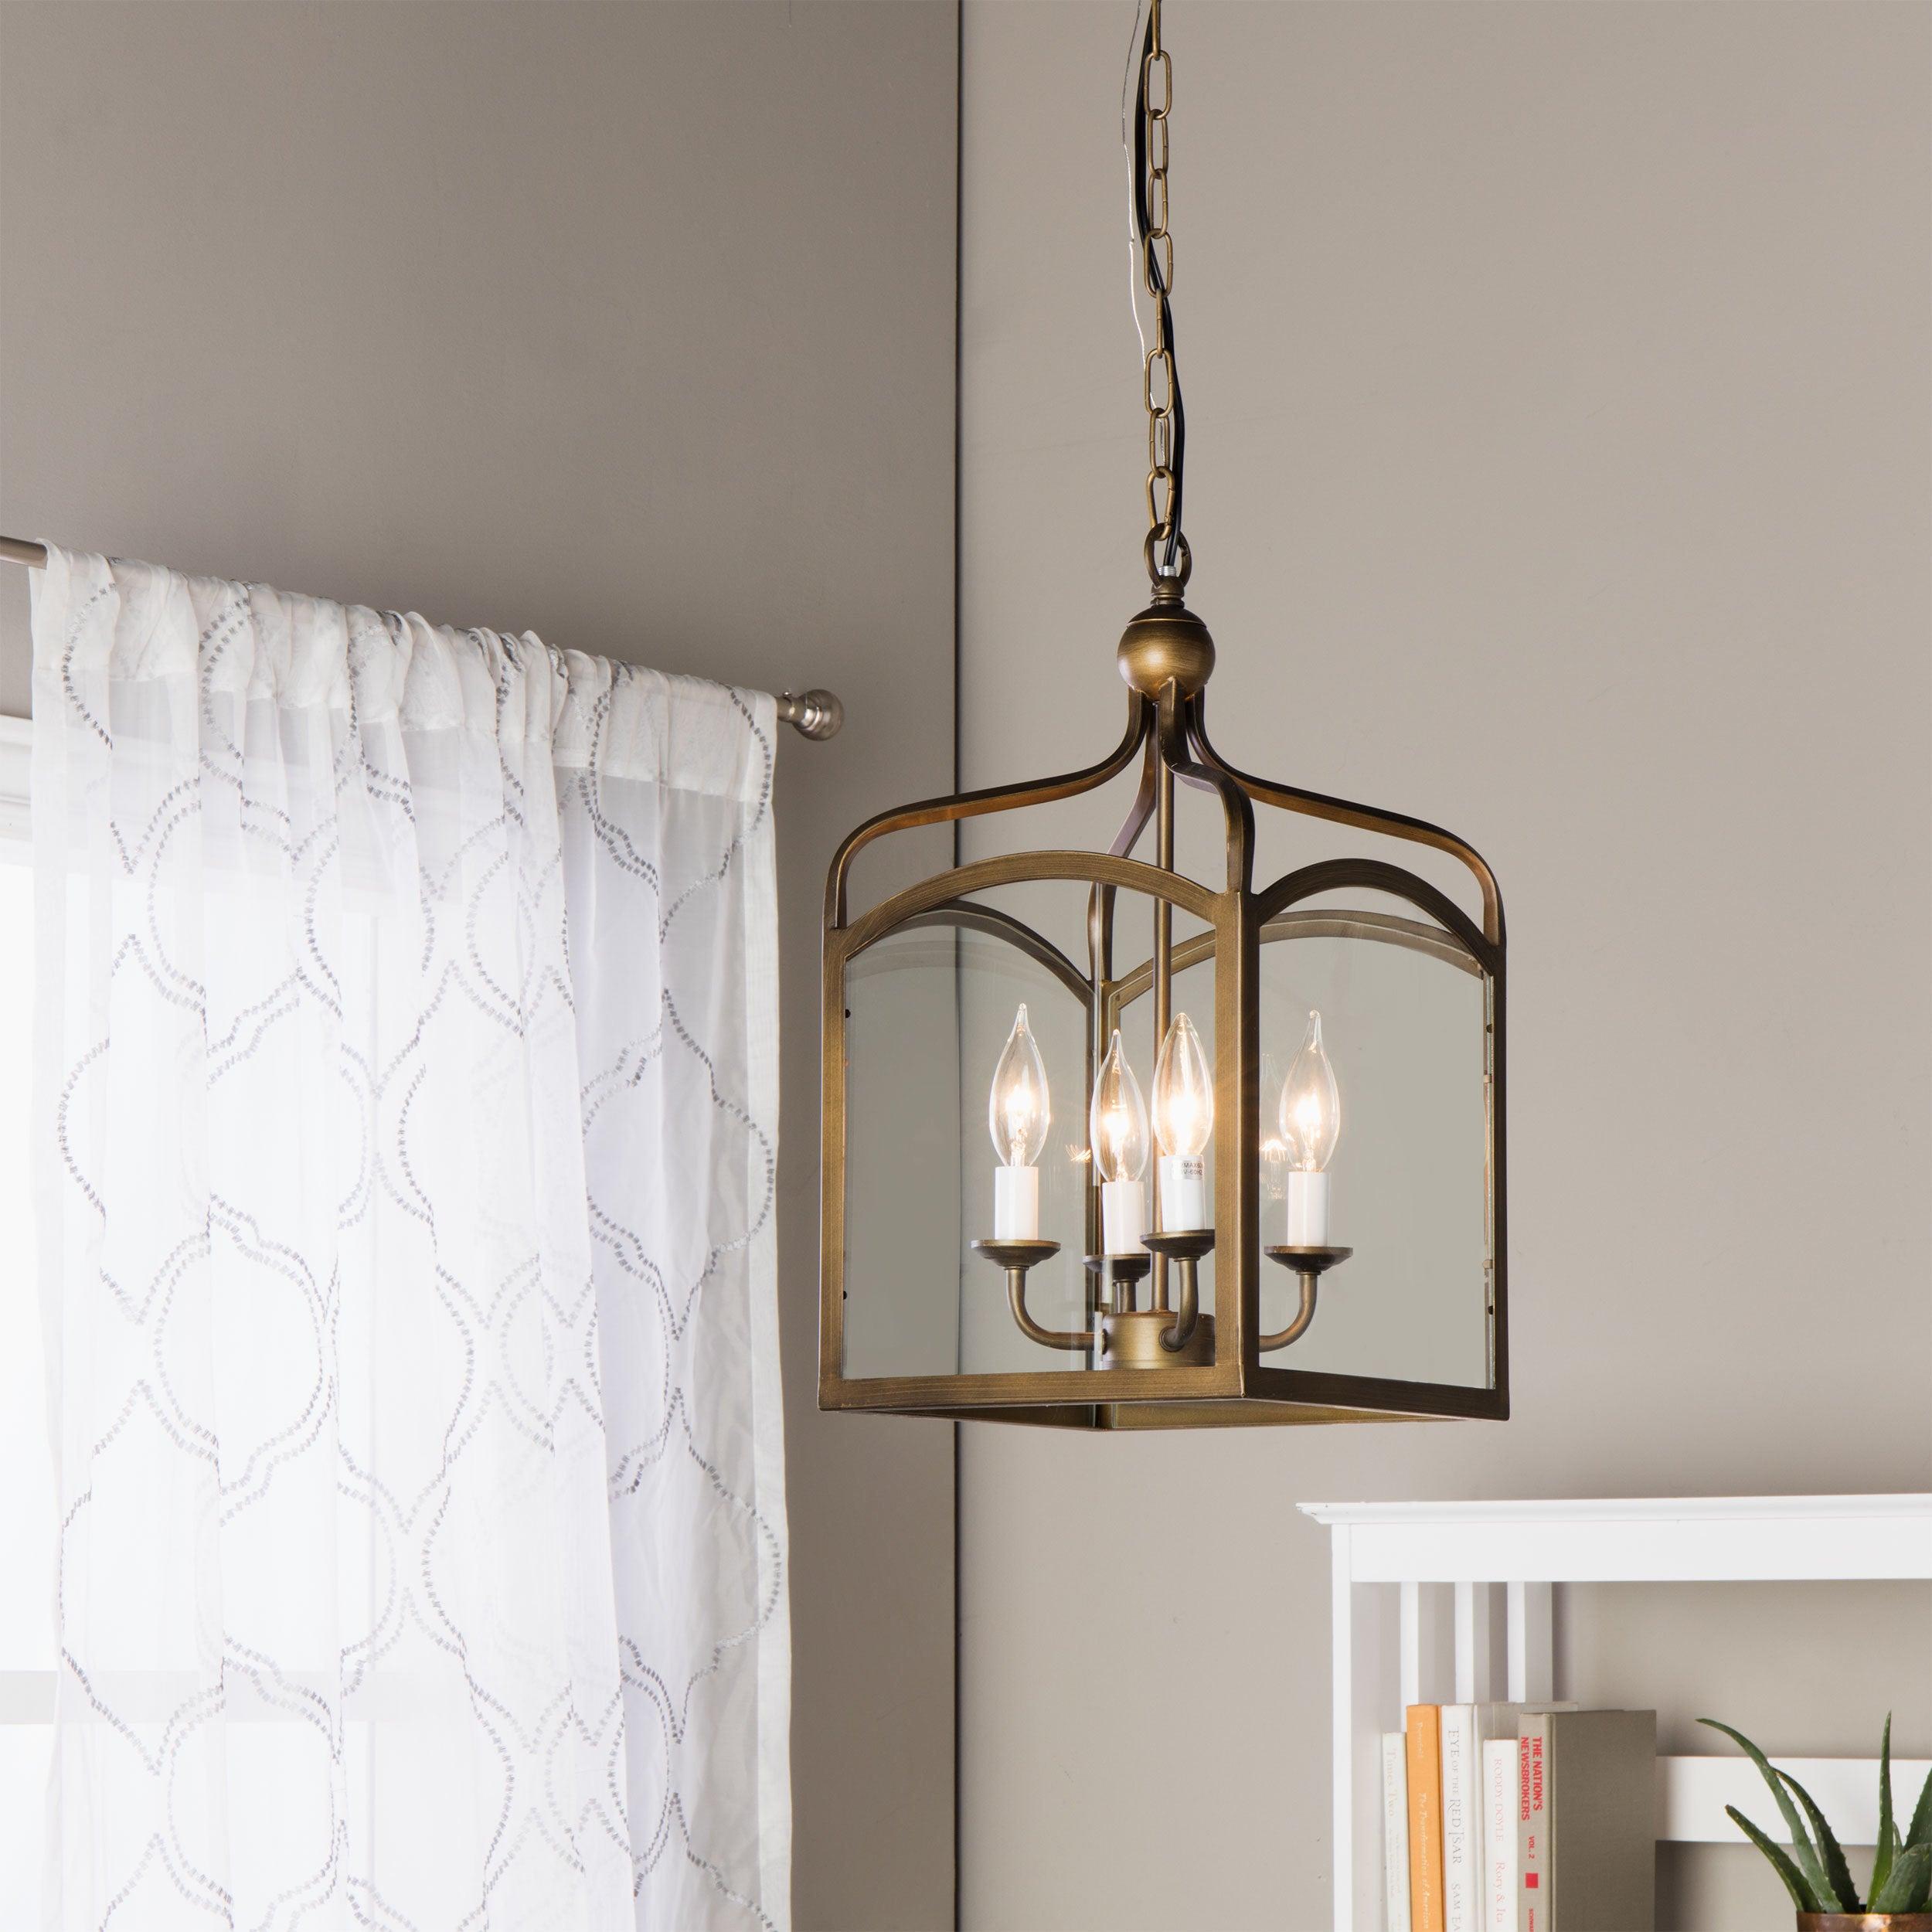 lighting hanging. Ashley Bronze 4-light Foyer Hanging Lantern - Free Shipping Today Overstock 14974443 Lighting